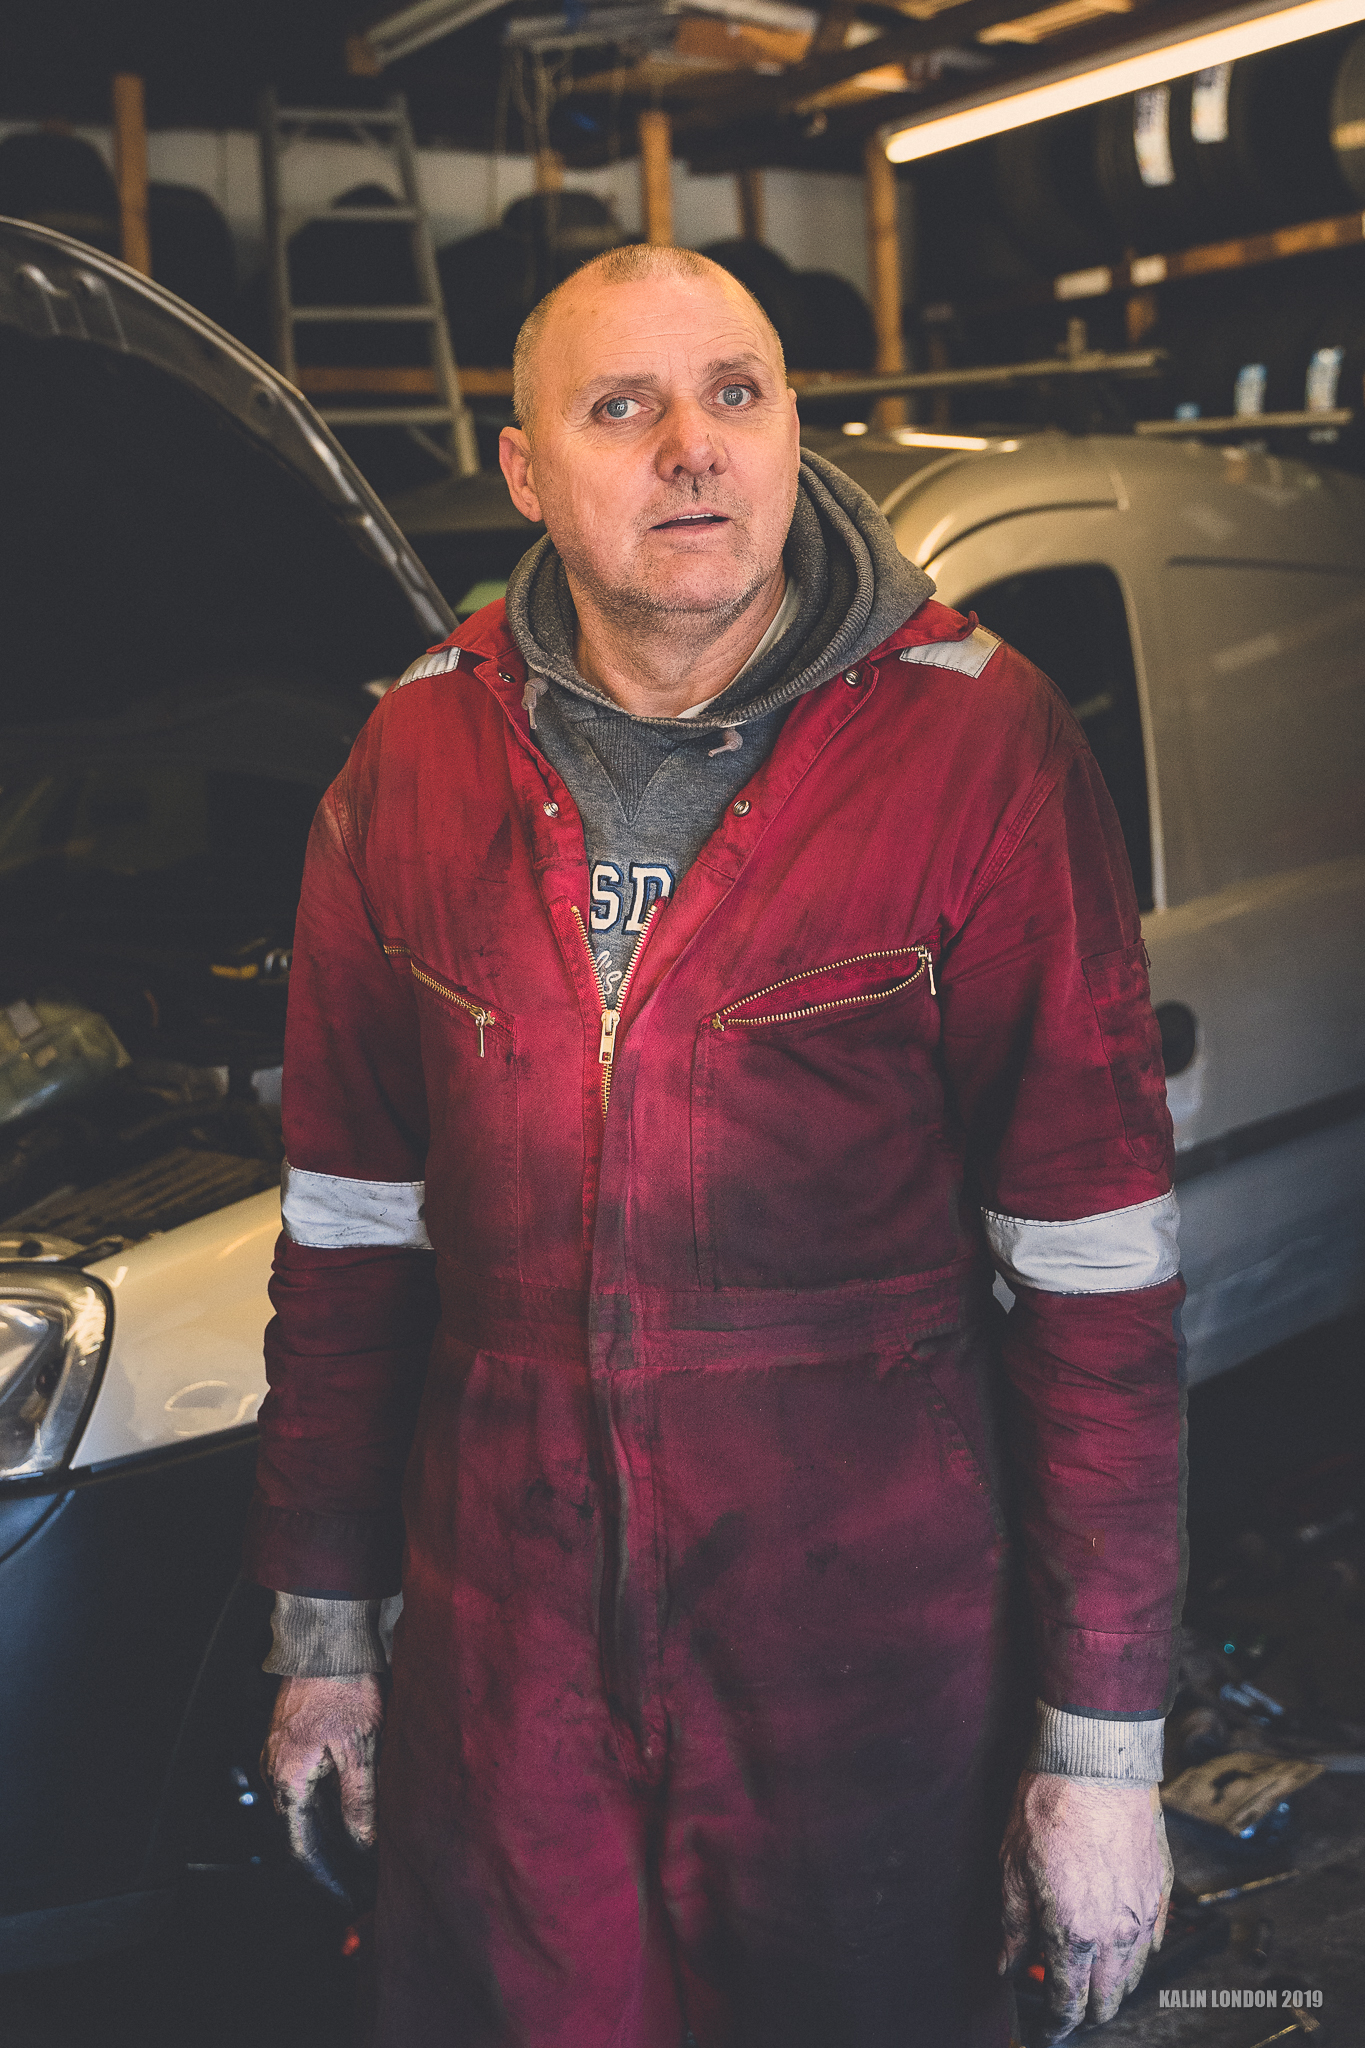 – My local mechanic –